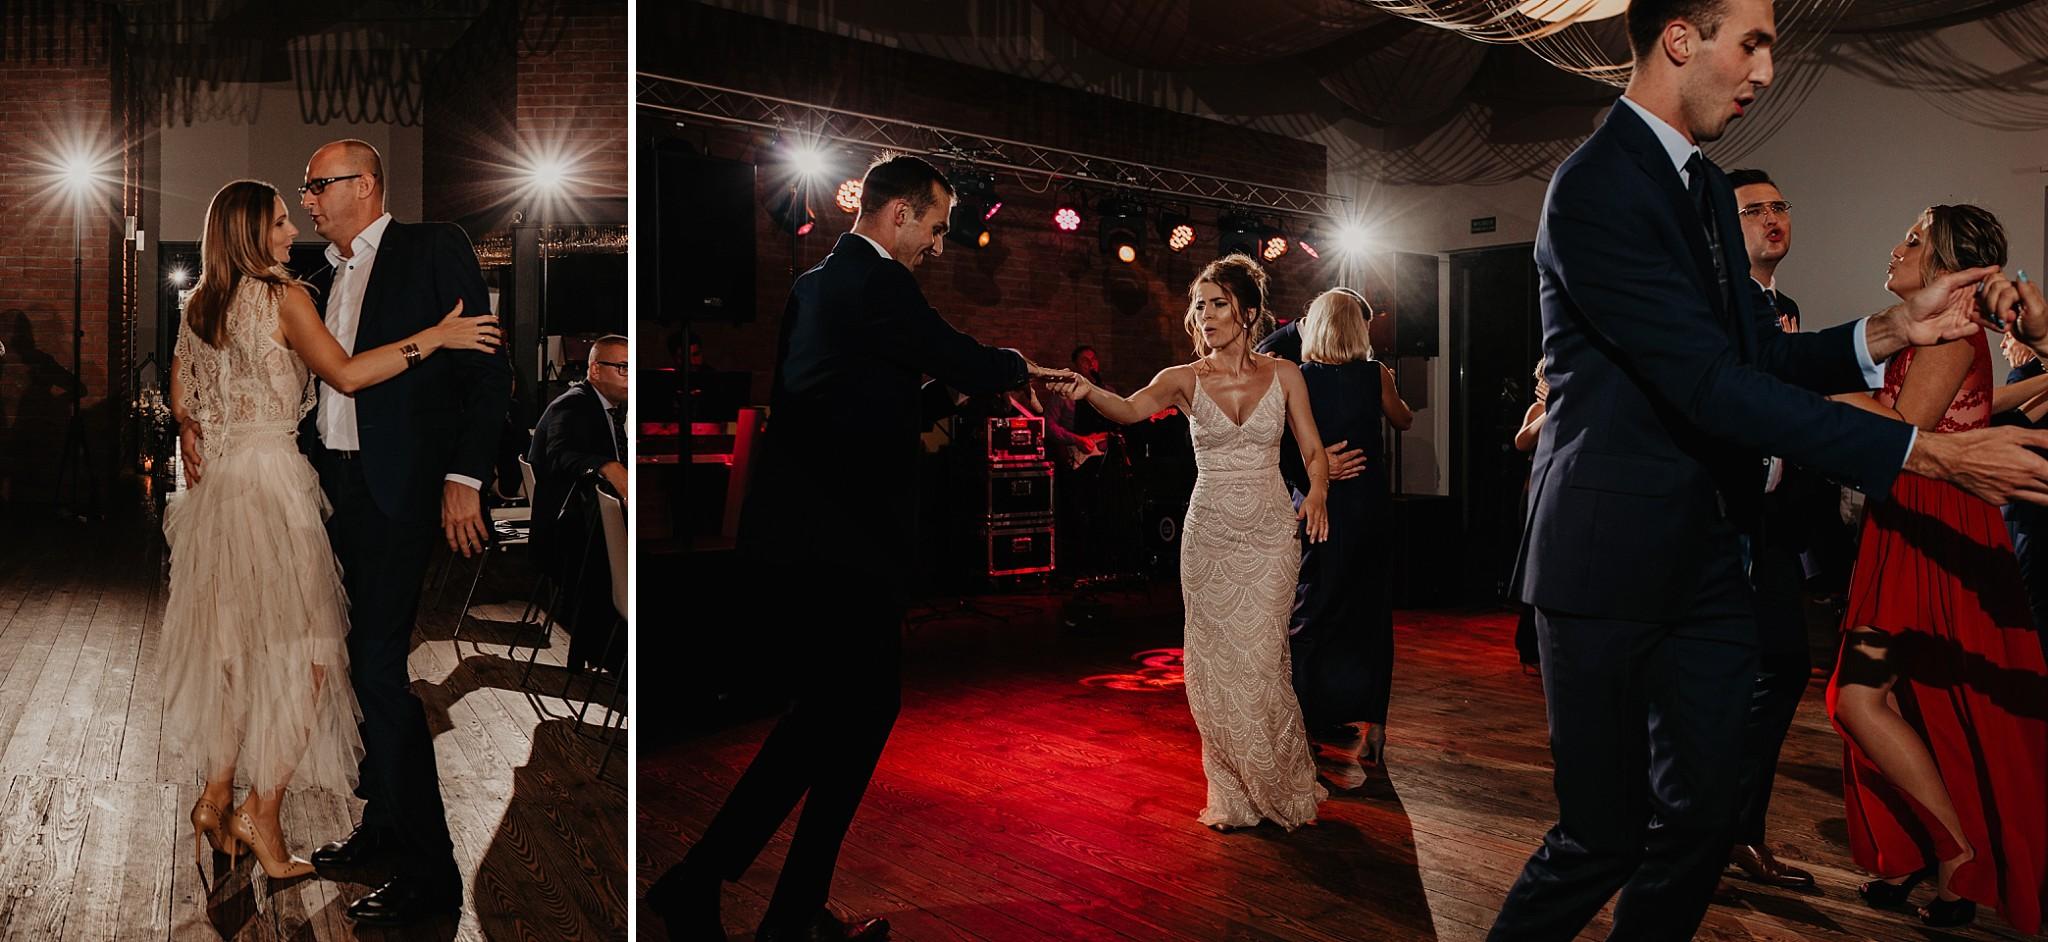 fotograf poznan wesele dobra truskawka piekne wesele pod poznaniem wesele w dobrej truskawce piekna para mloda slub marzen slub koronawirus slub listopad wesele koronawirus 387